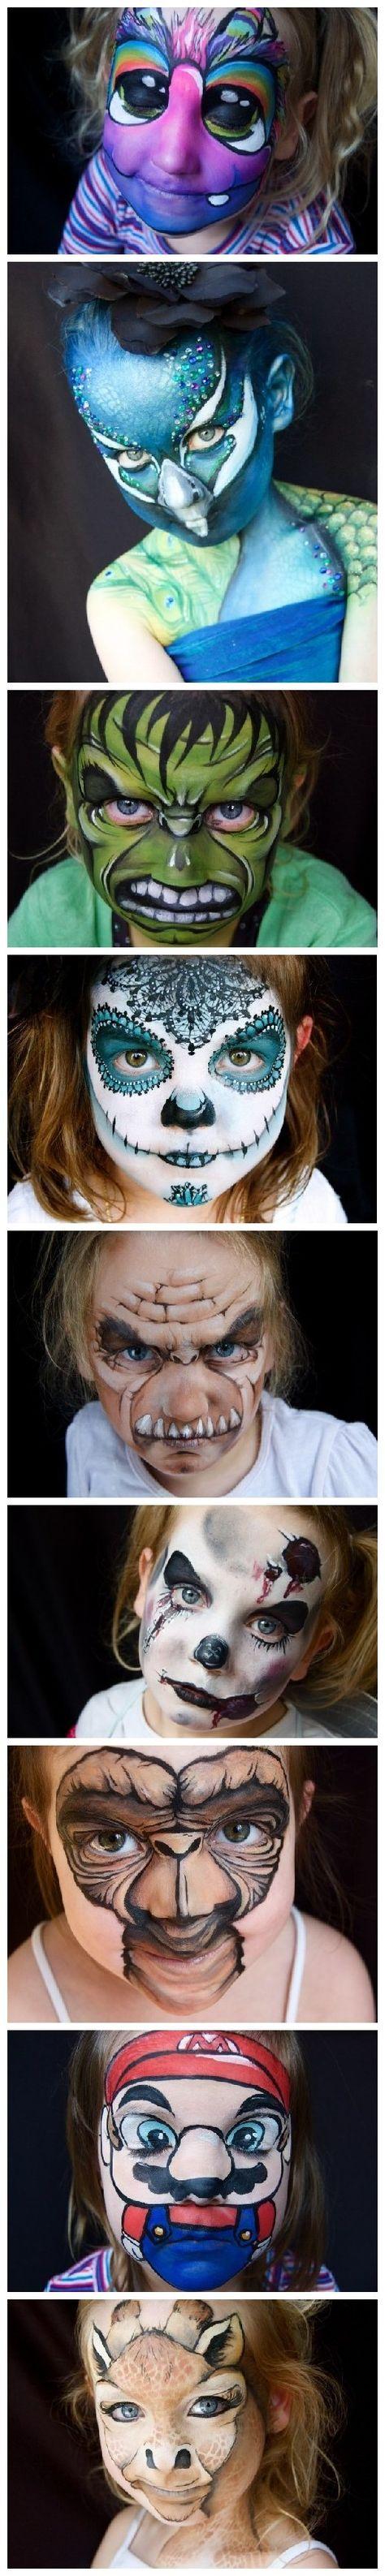 face Painted #Halloween #Halloween make-up